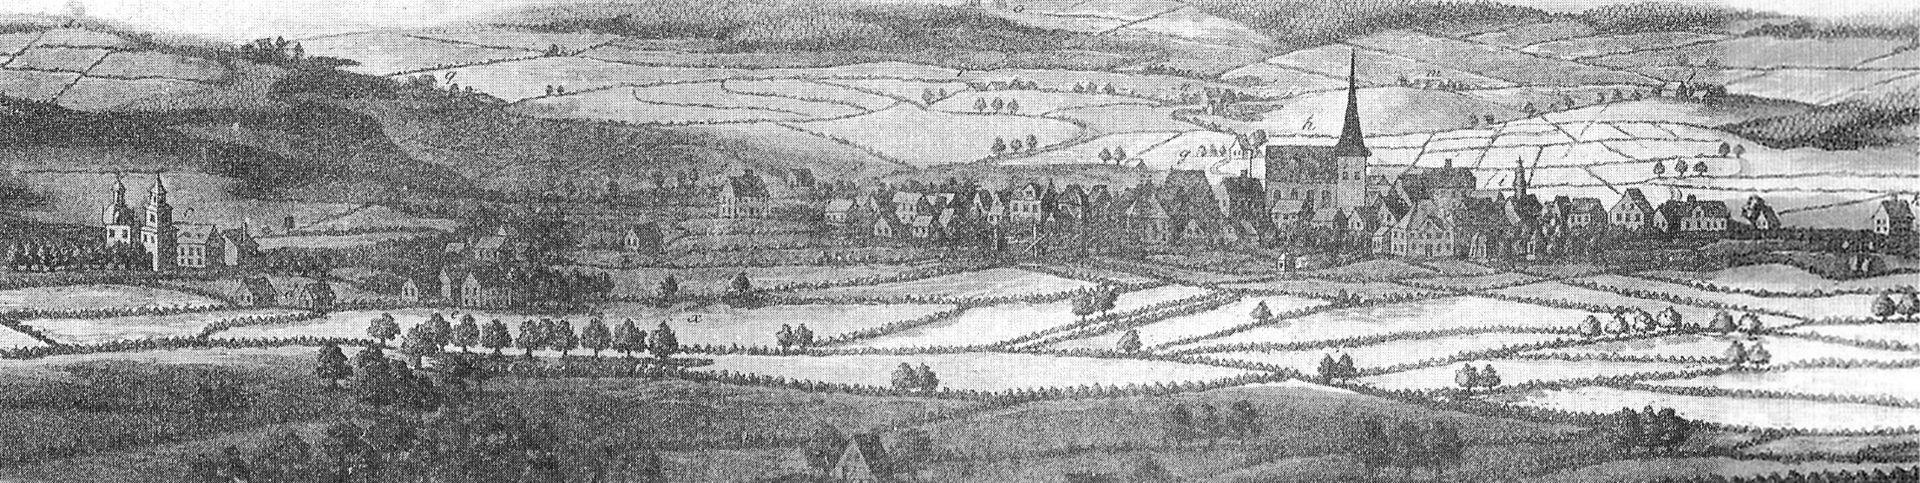 Schwelm 1788.jpg